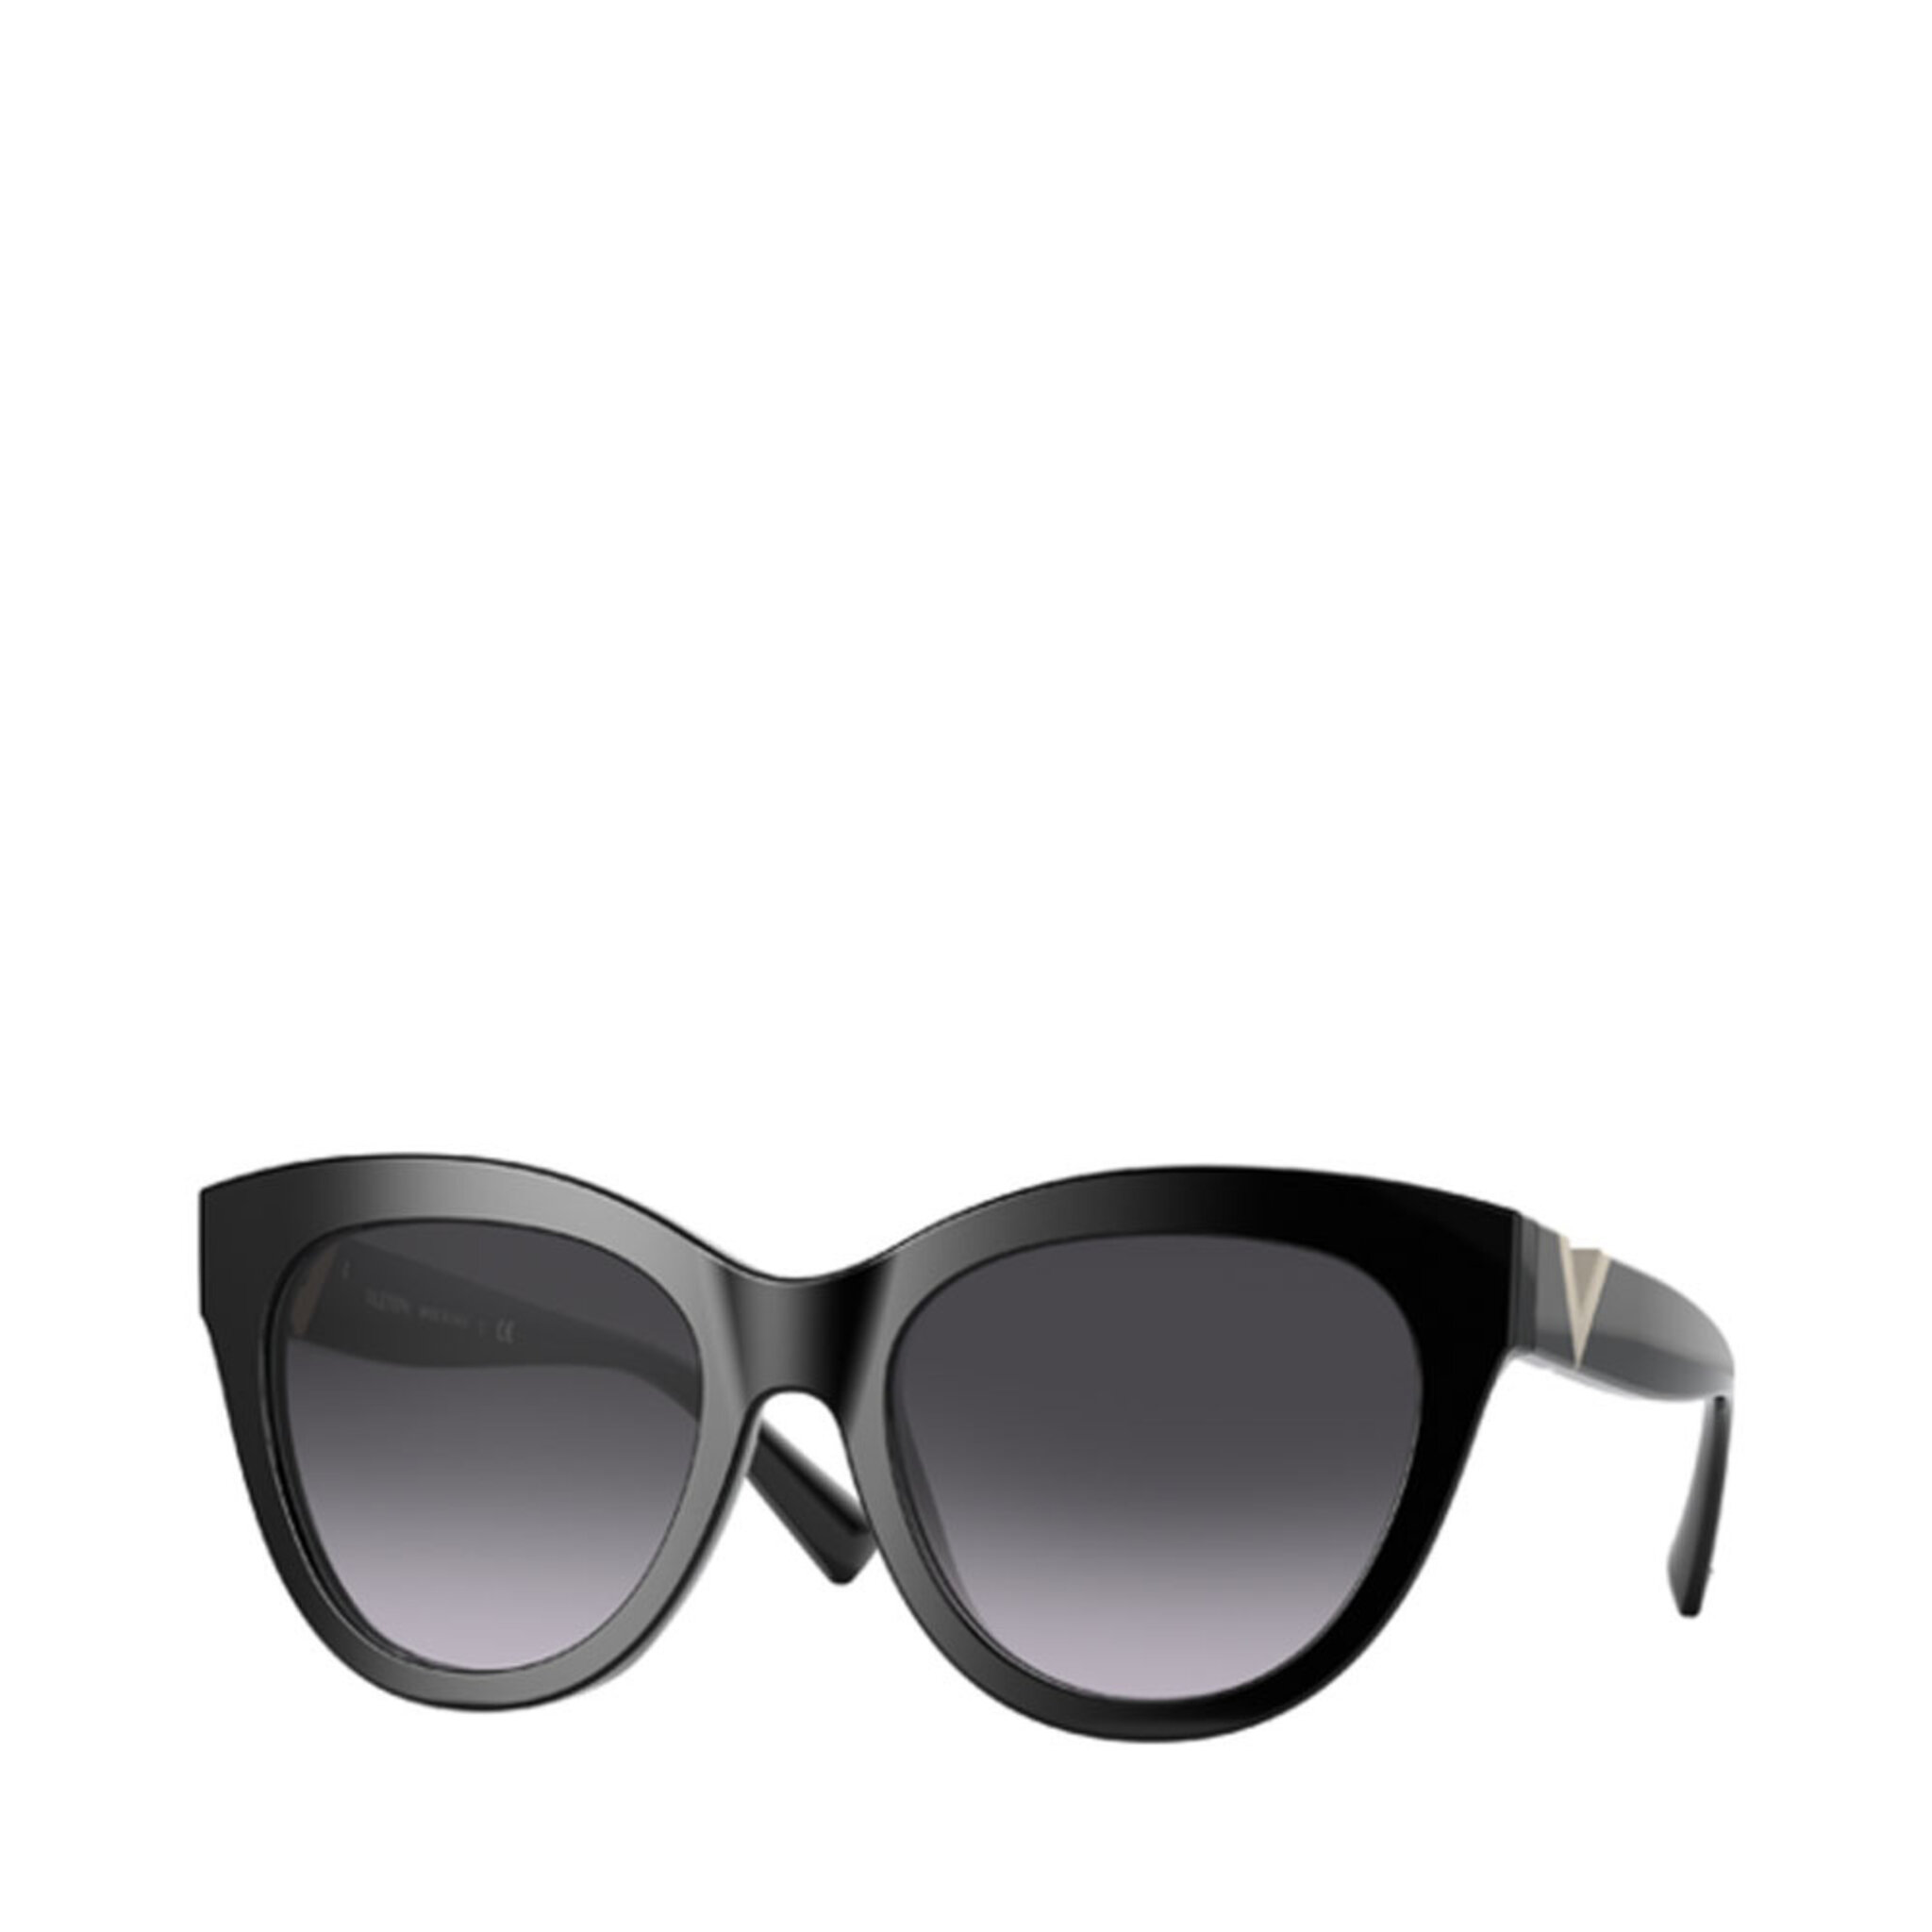 Sunglasses 0VA4089, 54